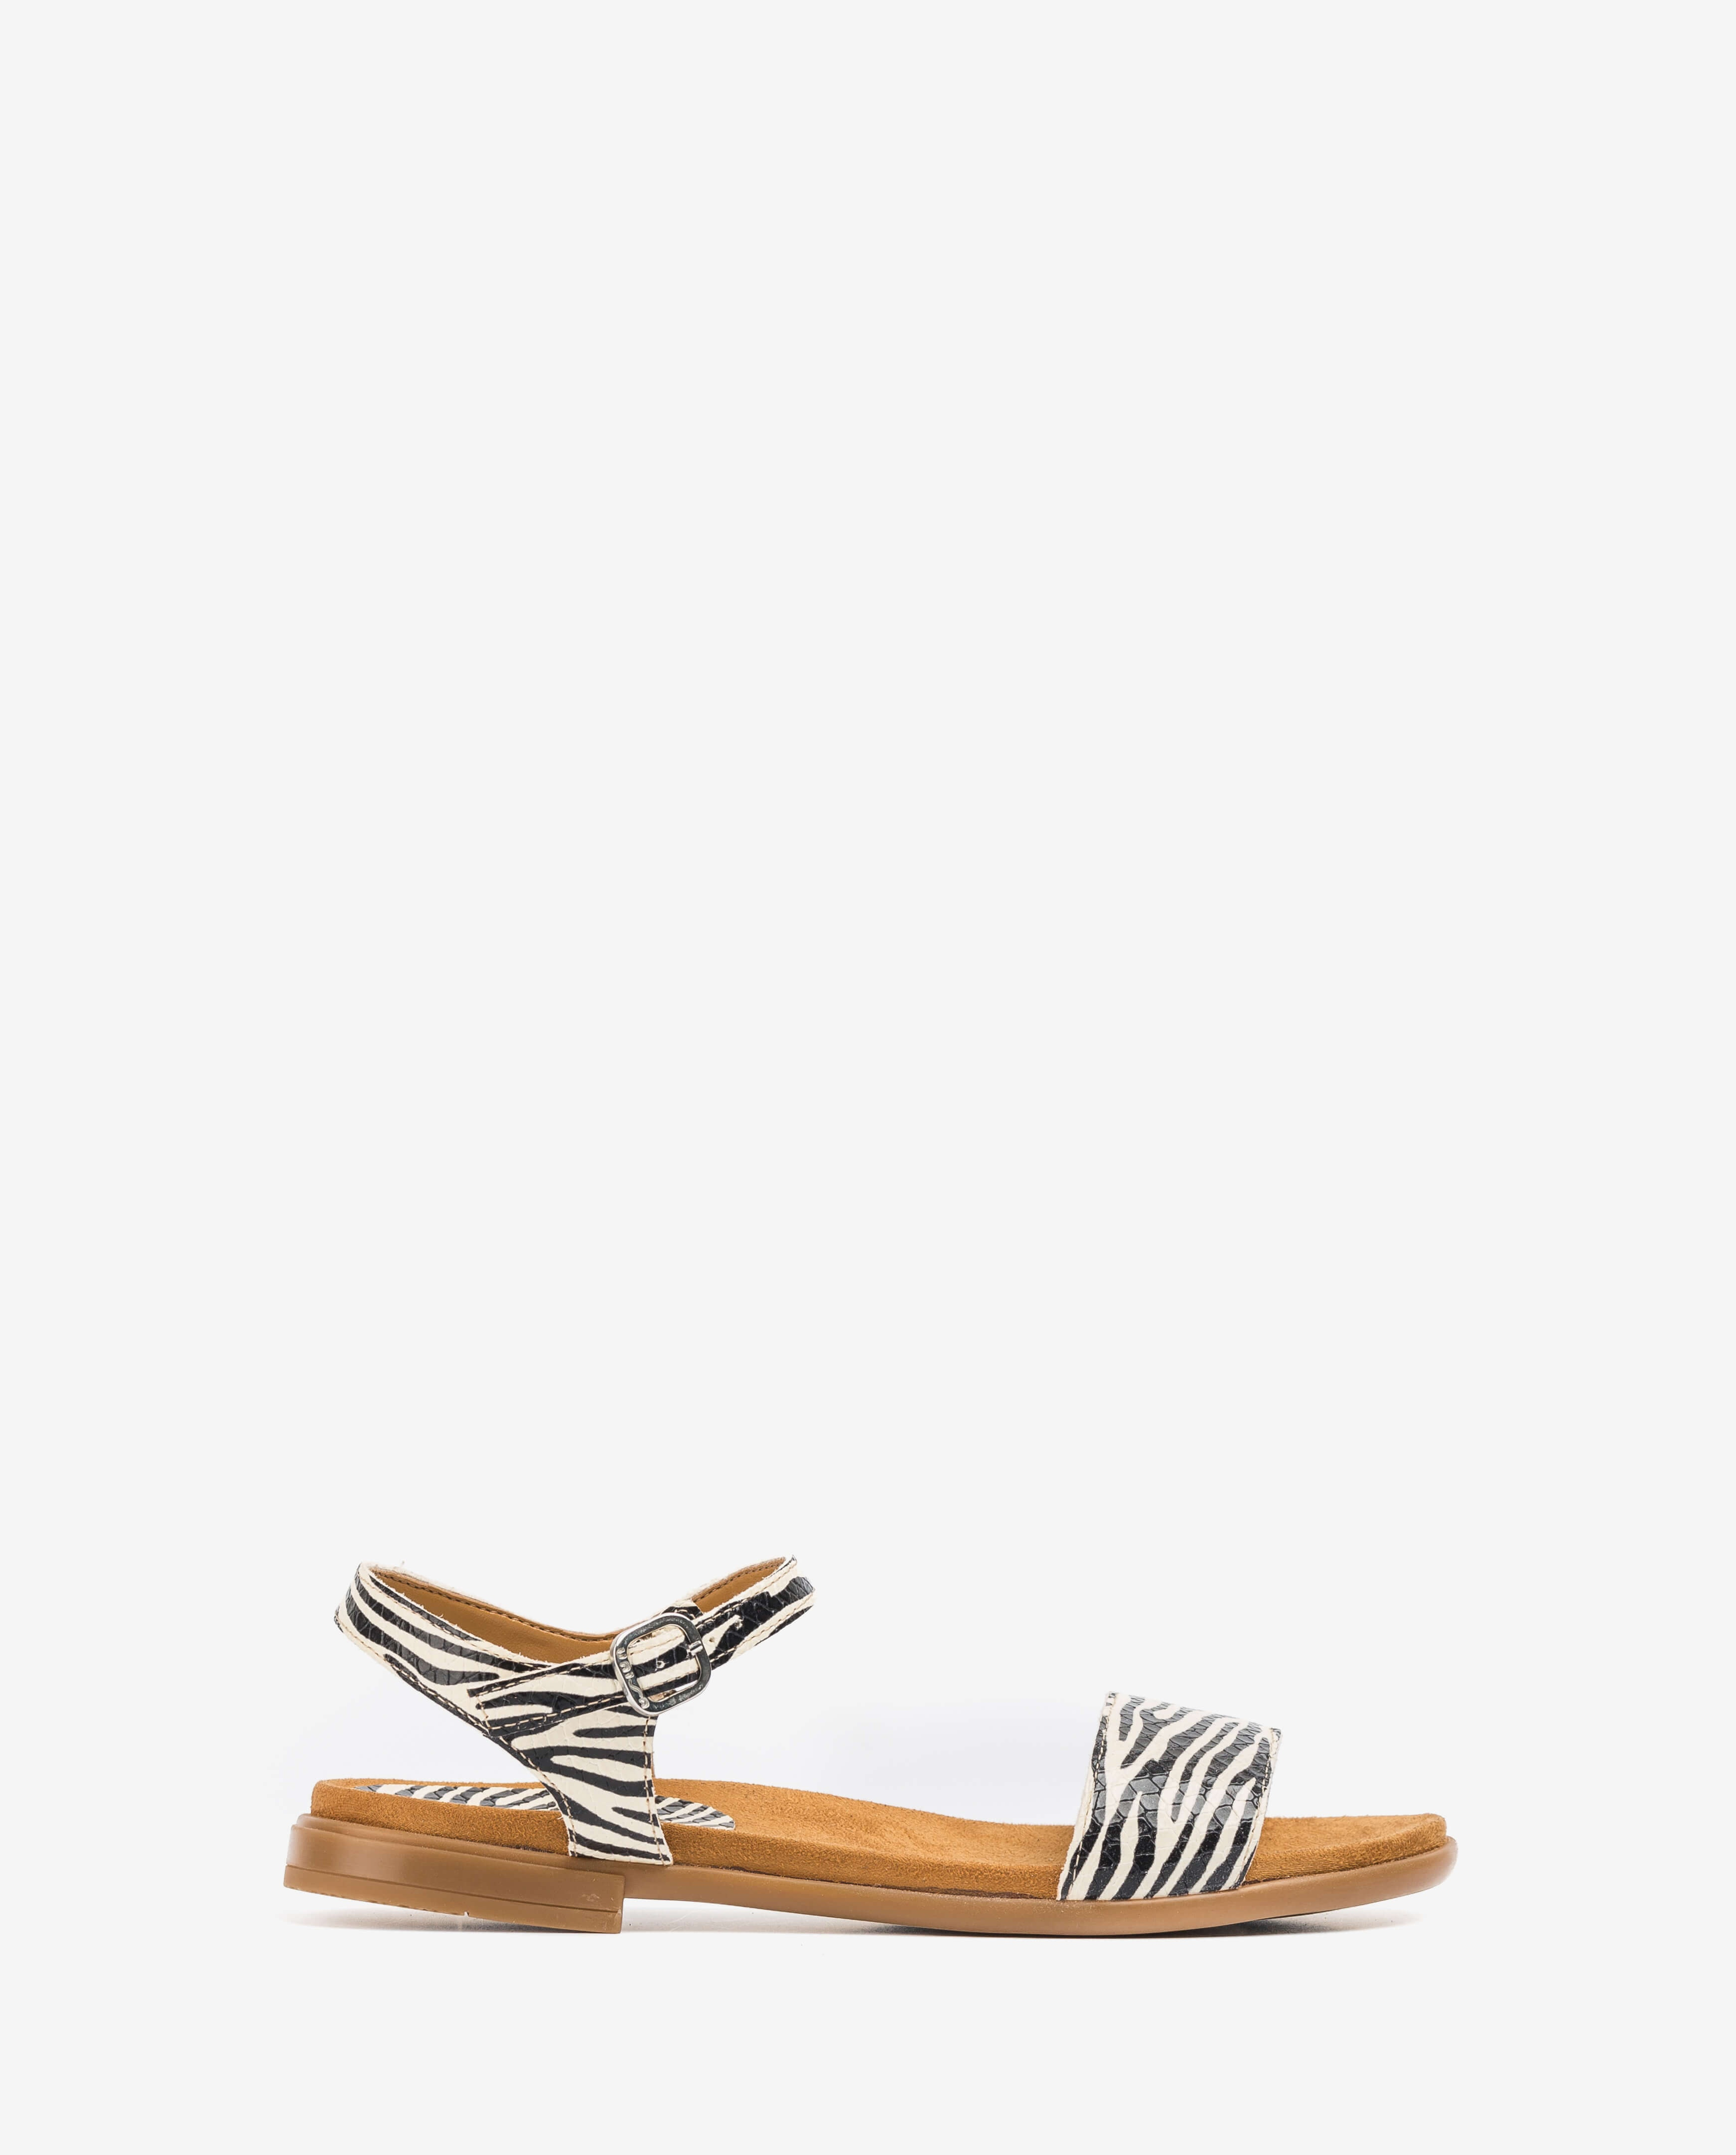 UNISA Mädchensandalen mit Zebra-Print LIRITA_20_C_ZEB_CAN ivory 5